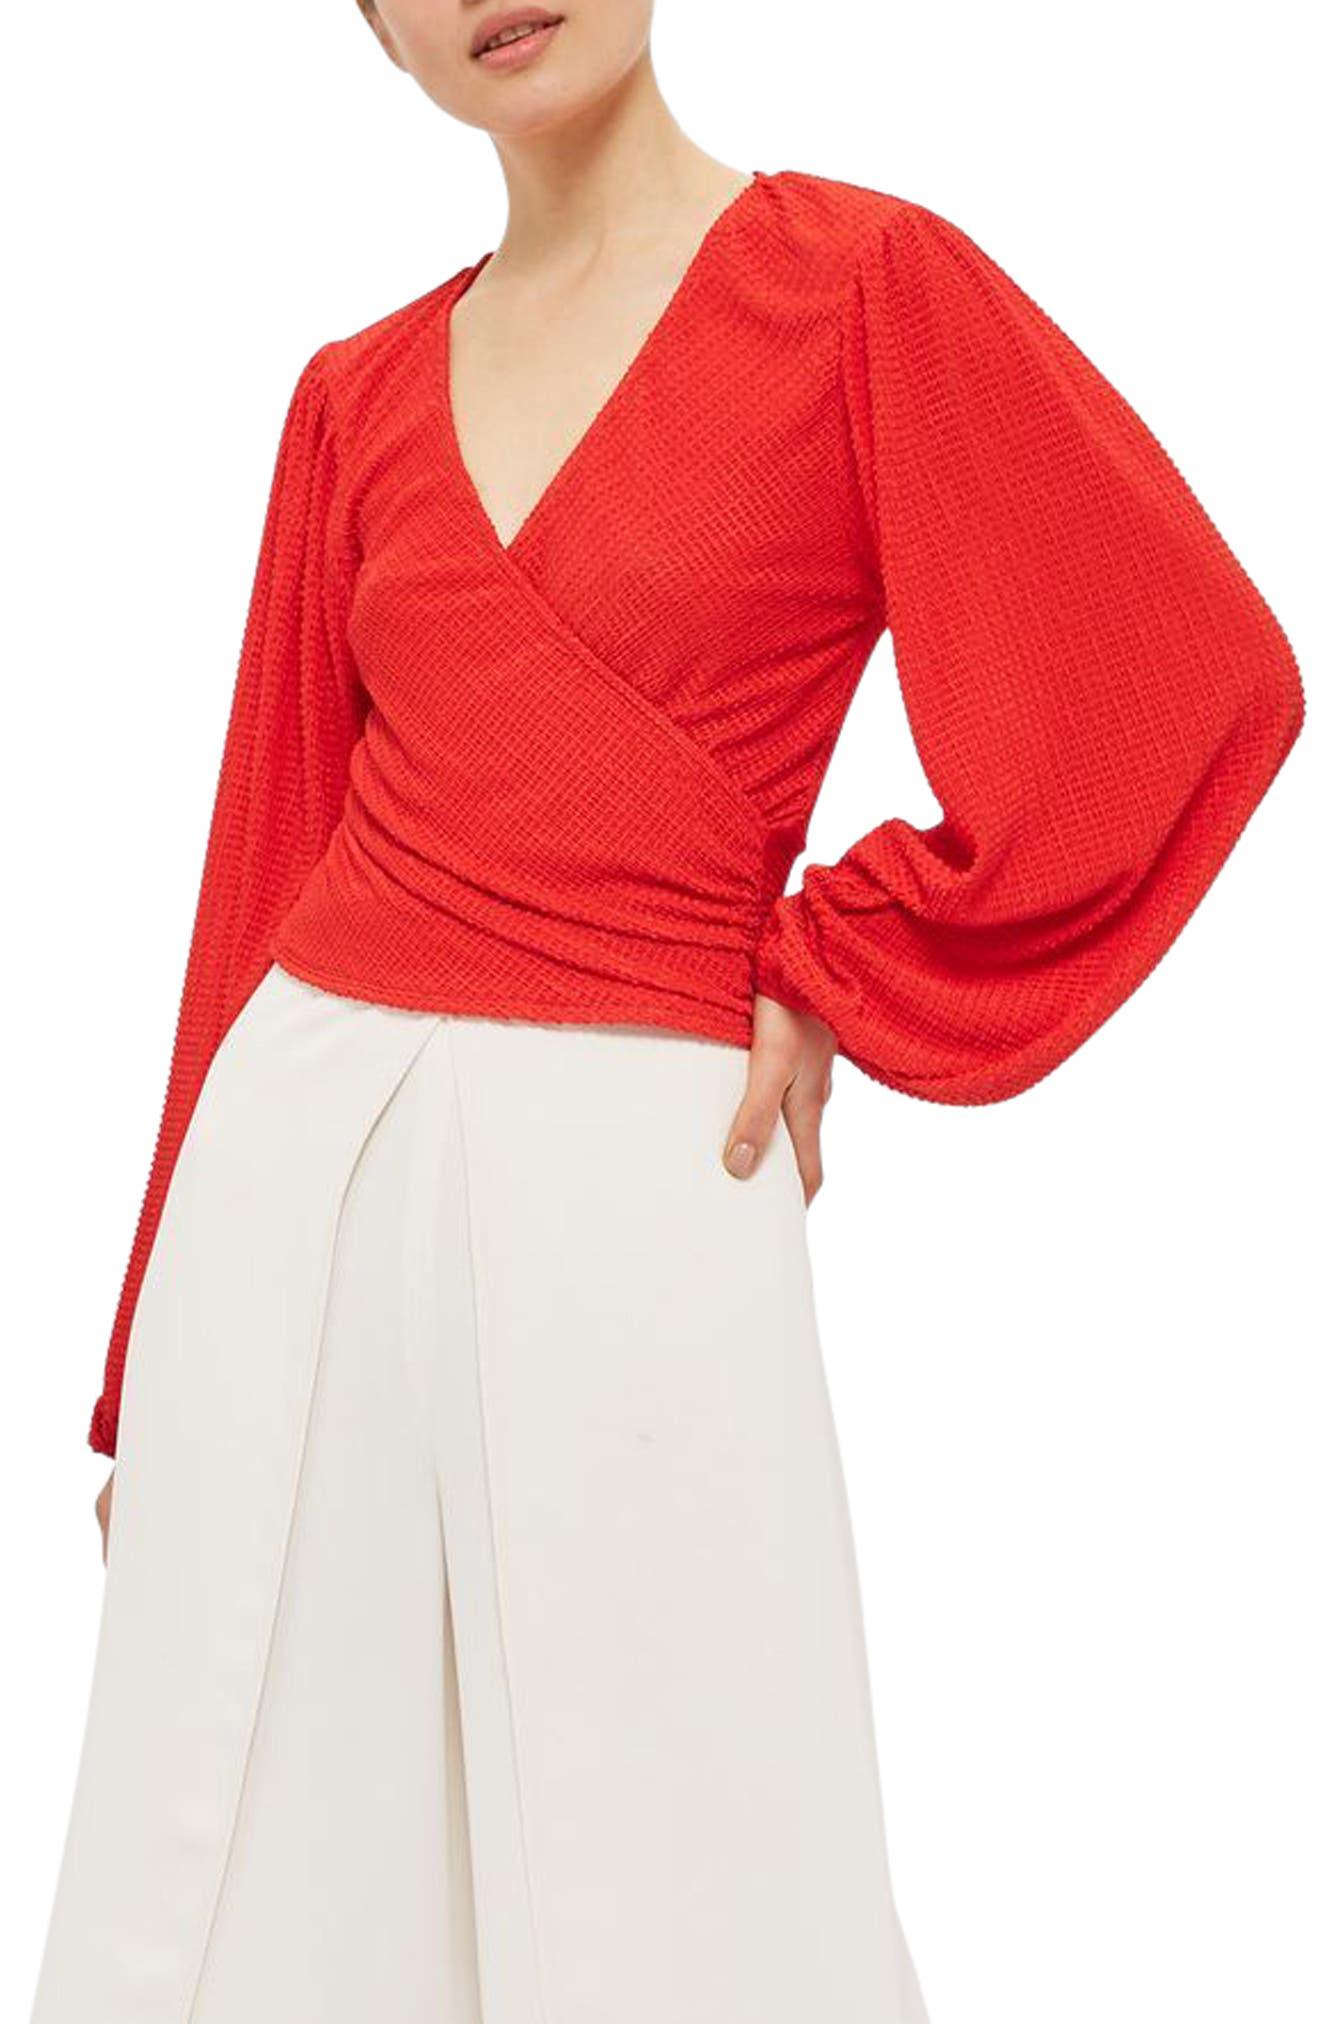 Main Image - Topshop Blouson Sleeve Textured Wrap Top